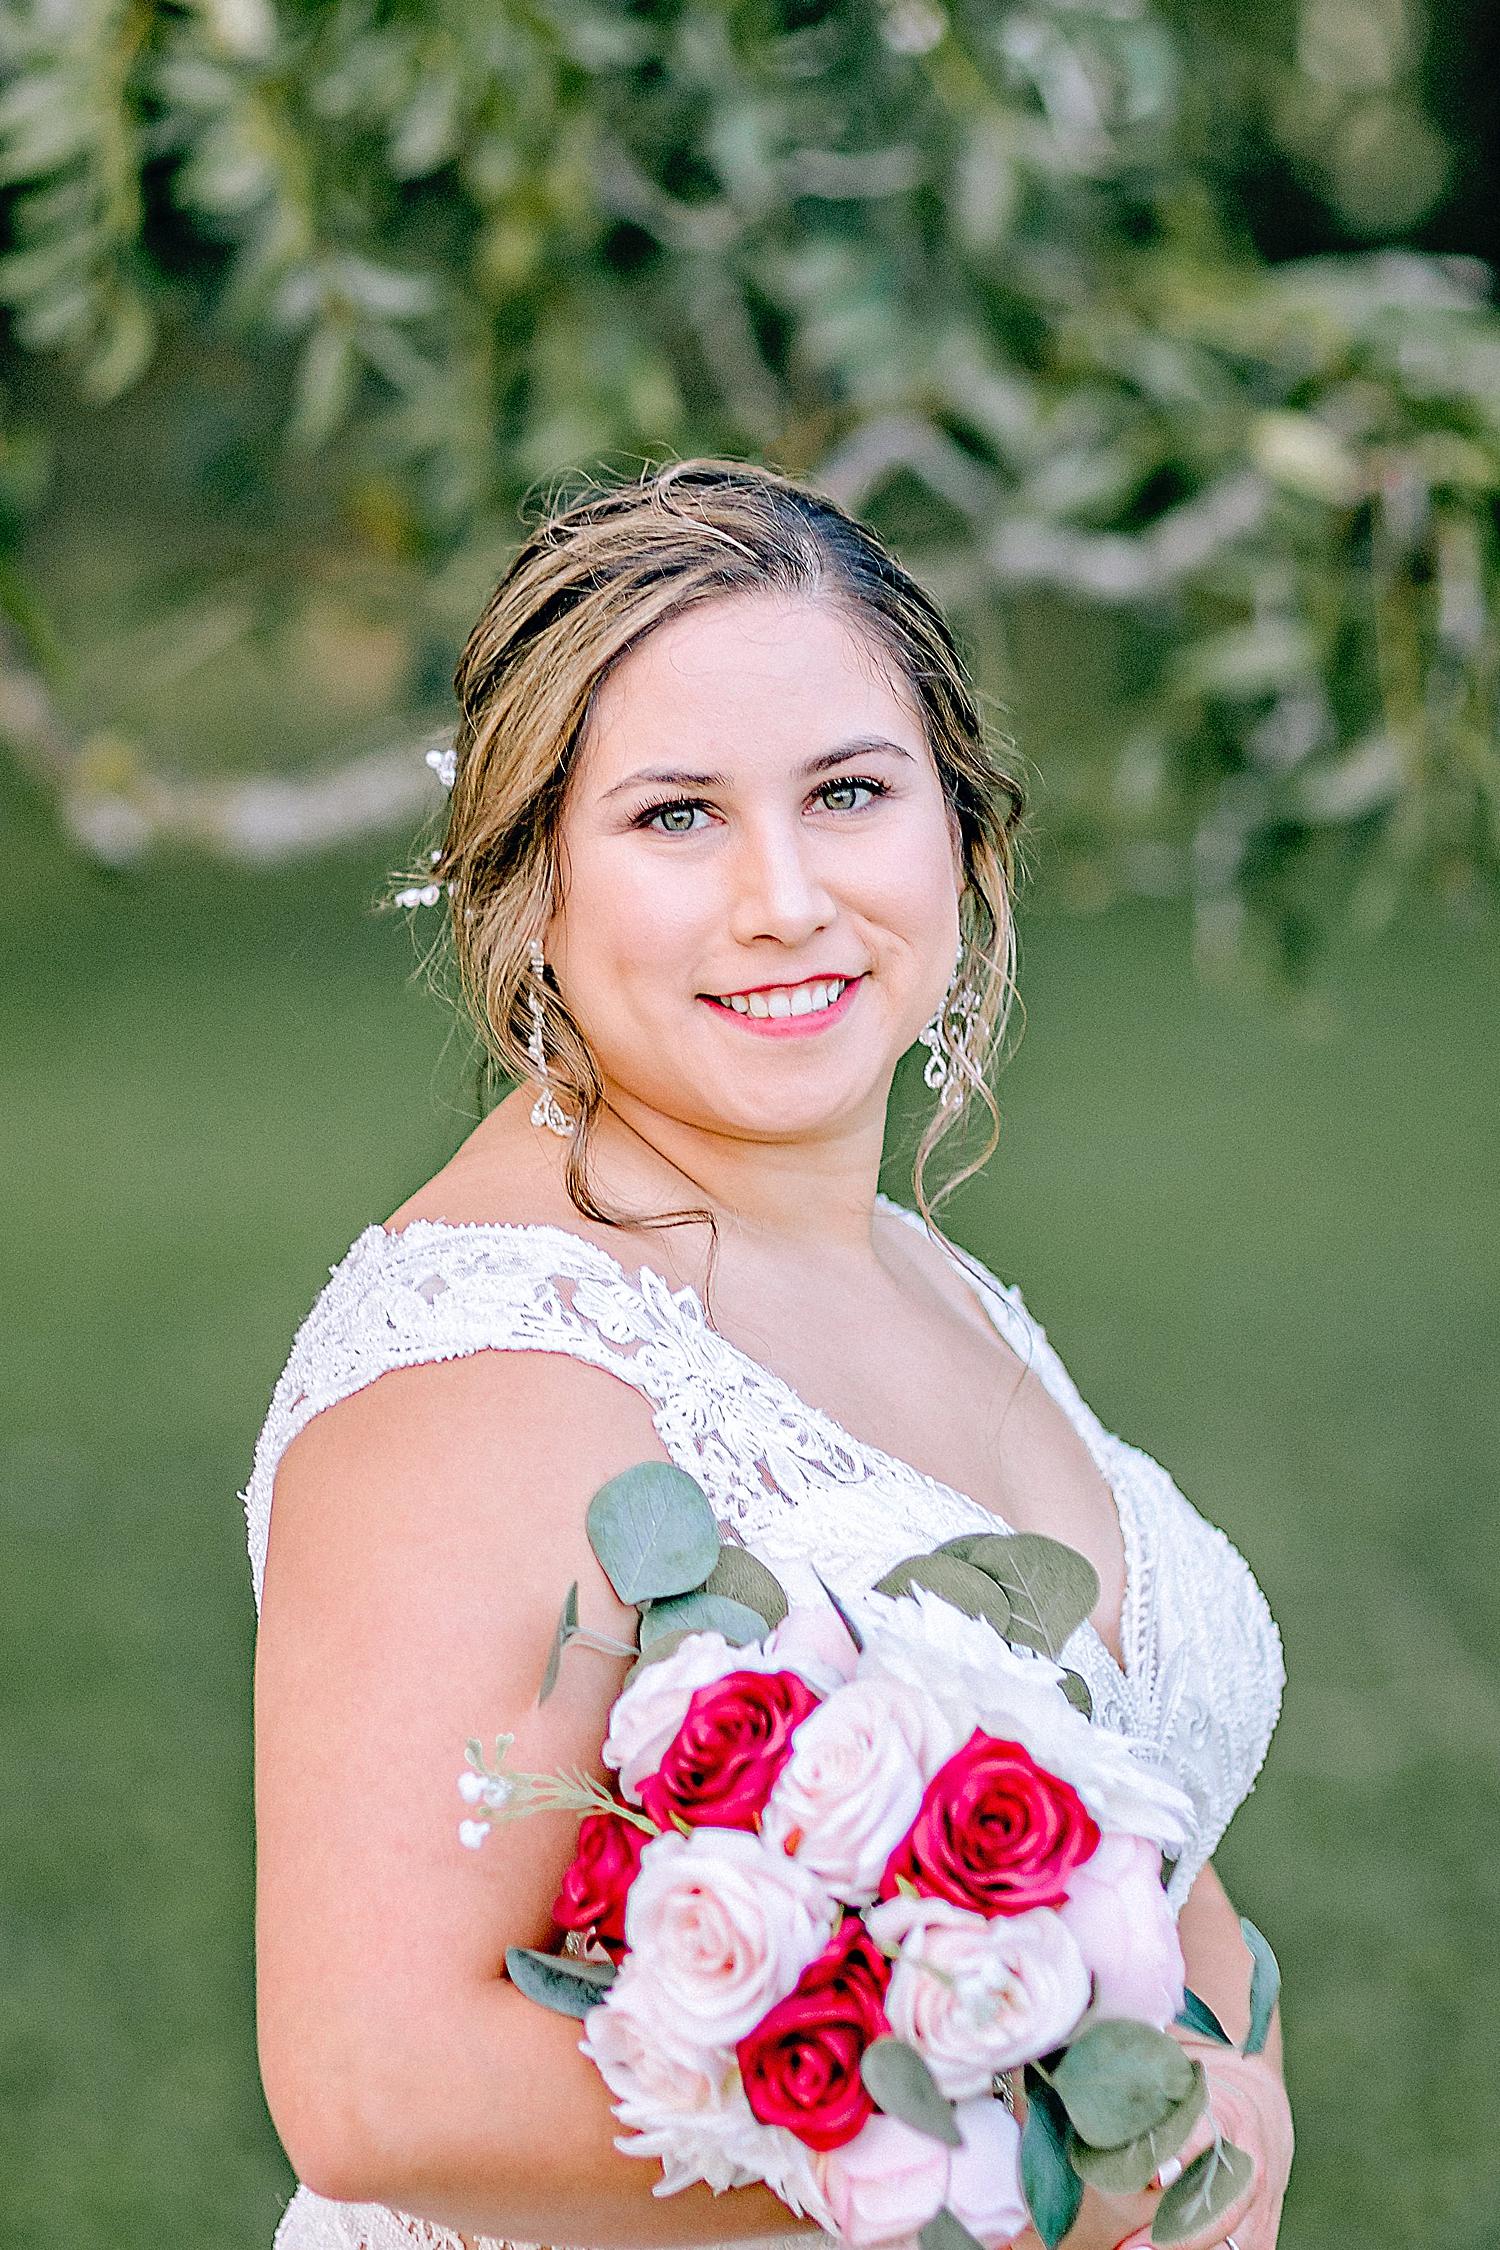 Carly-Barton-Photography-Gruene-Estate-Wedding-Photographer-New-Braunfels-Texas-Bridal-Session_0028.jpg